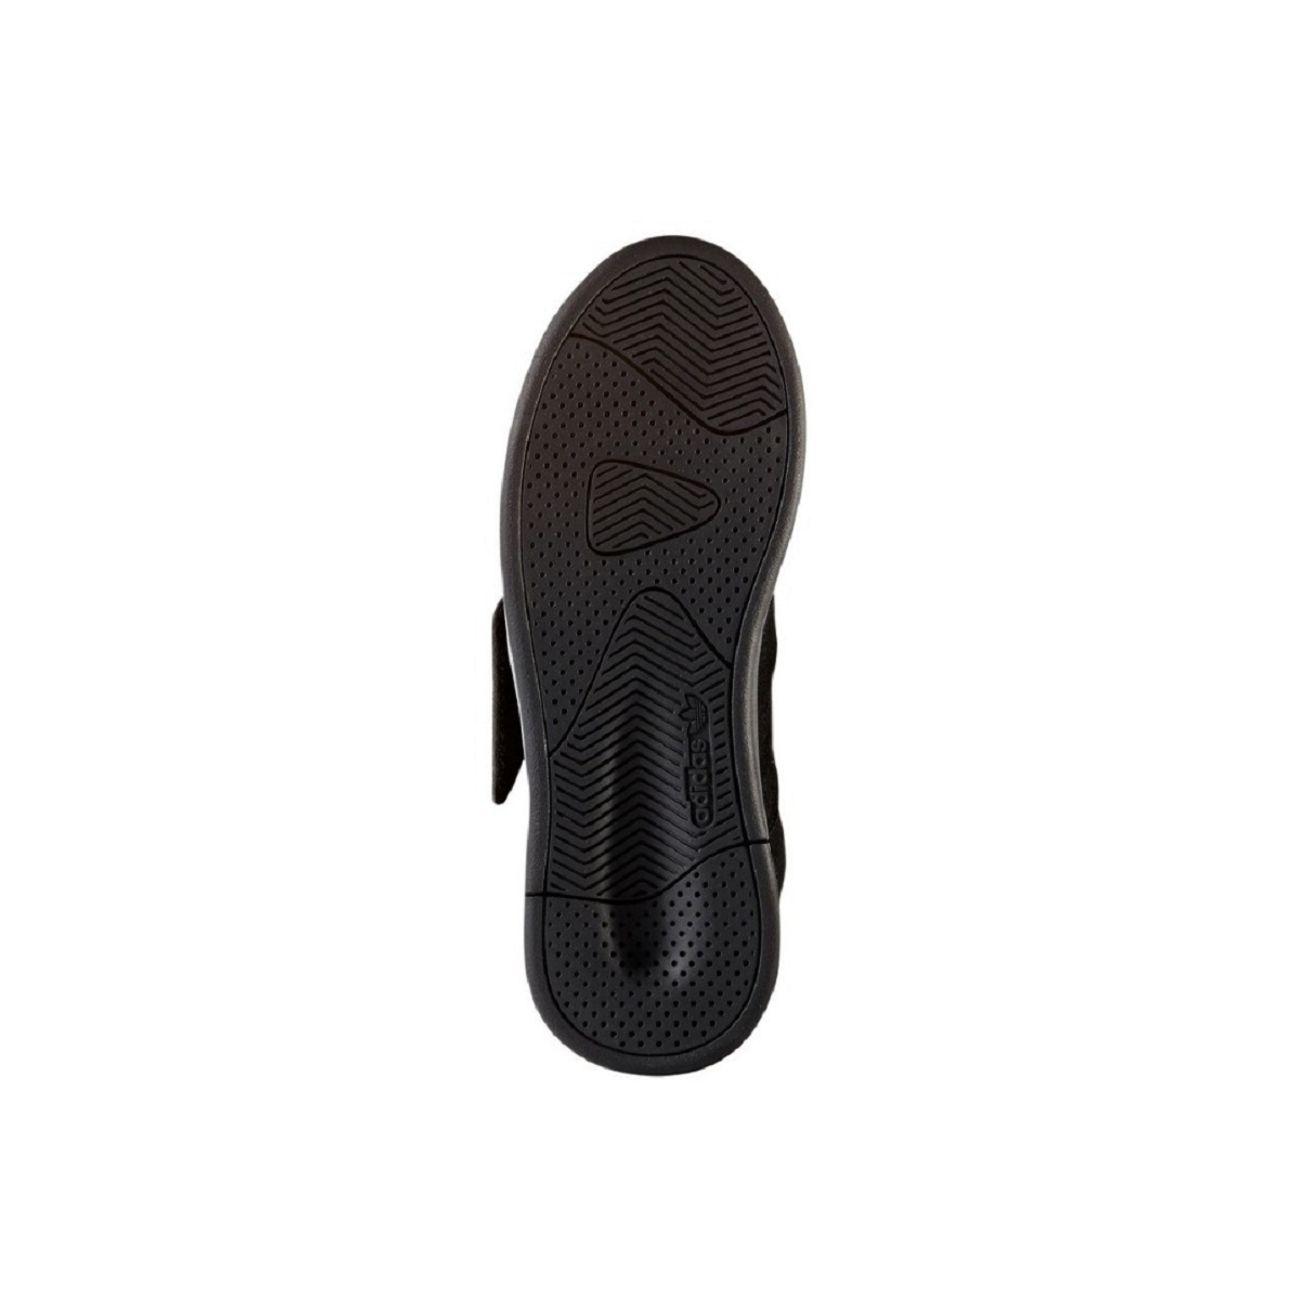 reputable site d8a65 6c774 enfant ADIDAS Chaussures Sportswear Enfant Adidas Tubular Invader Strap J